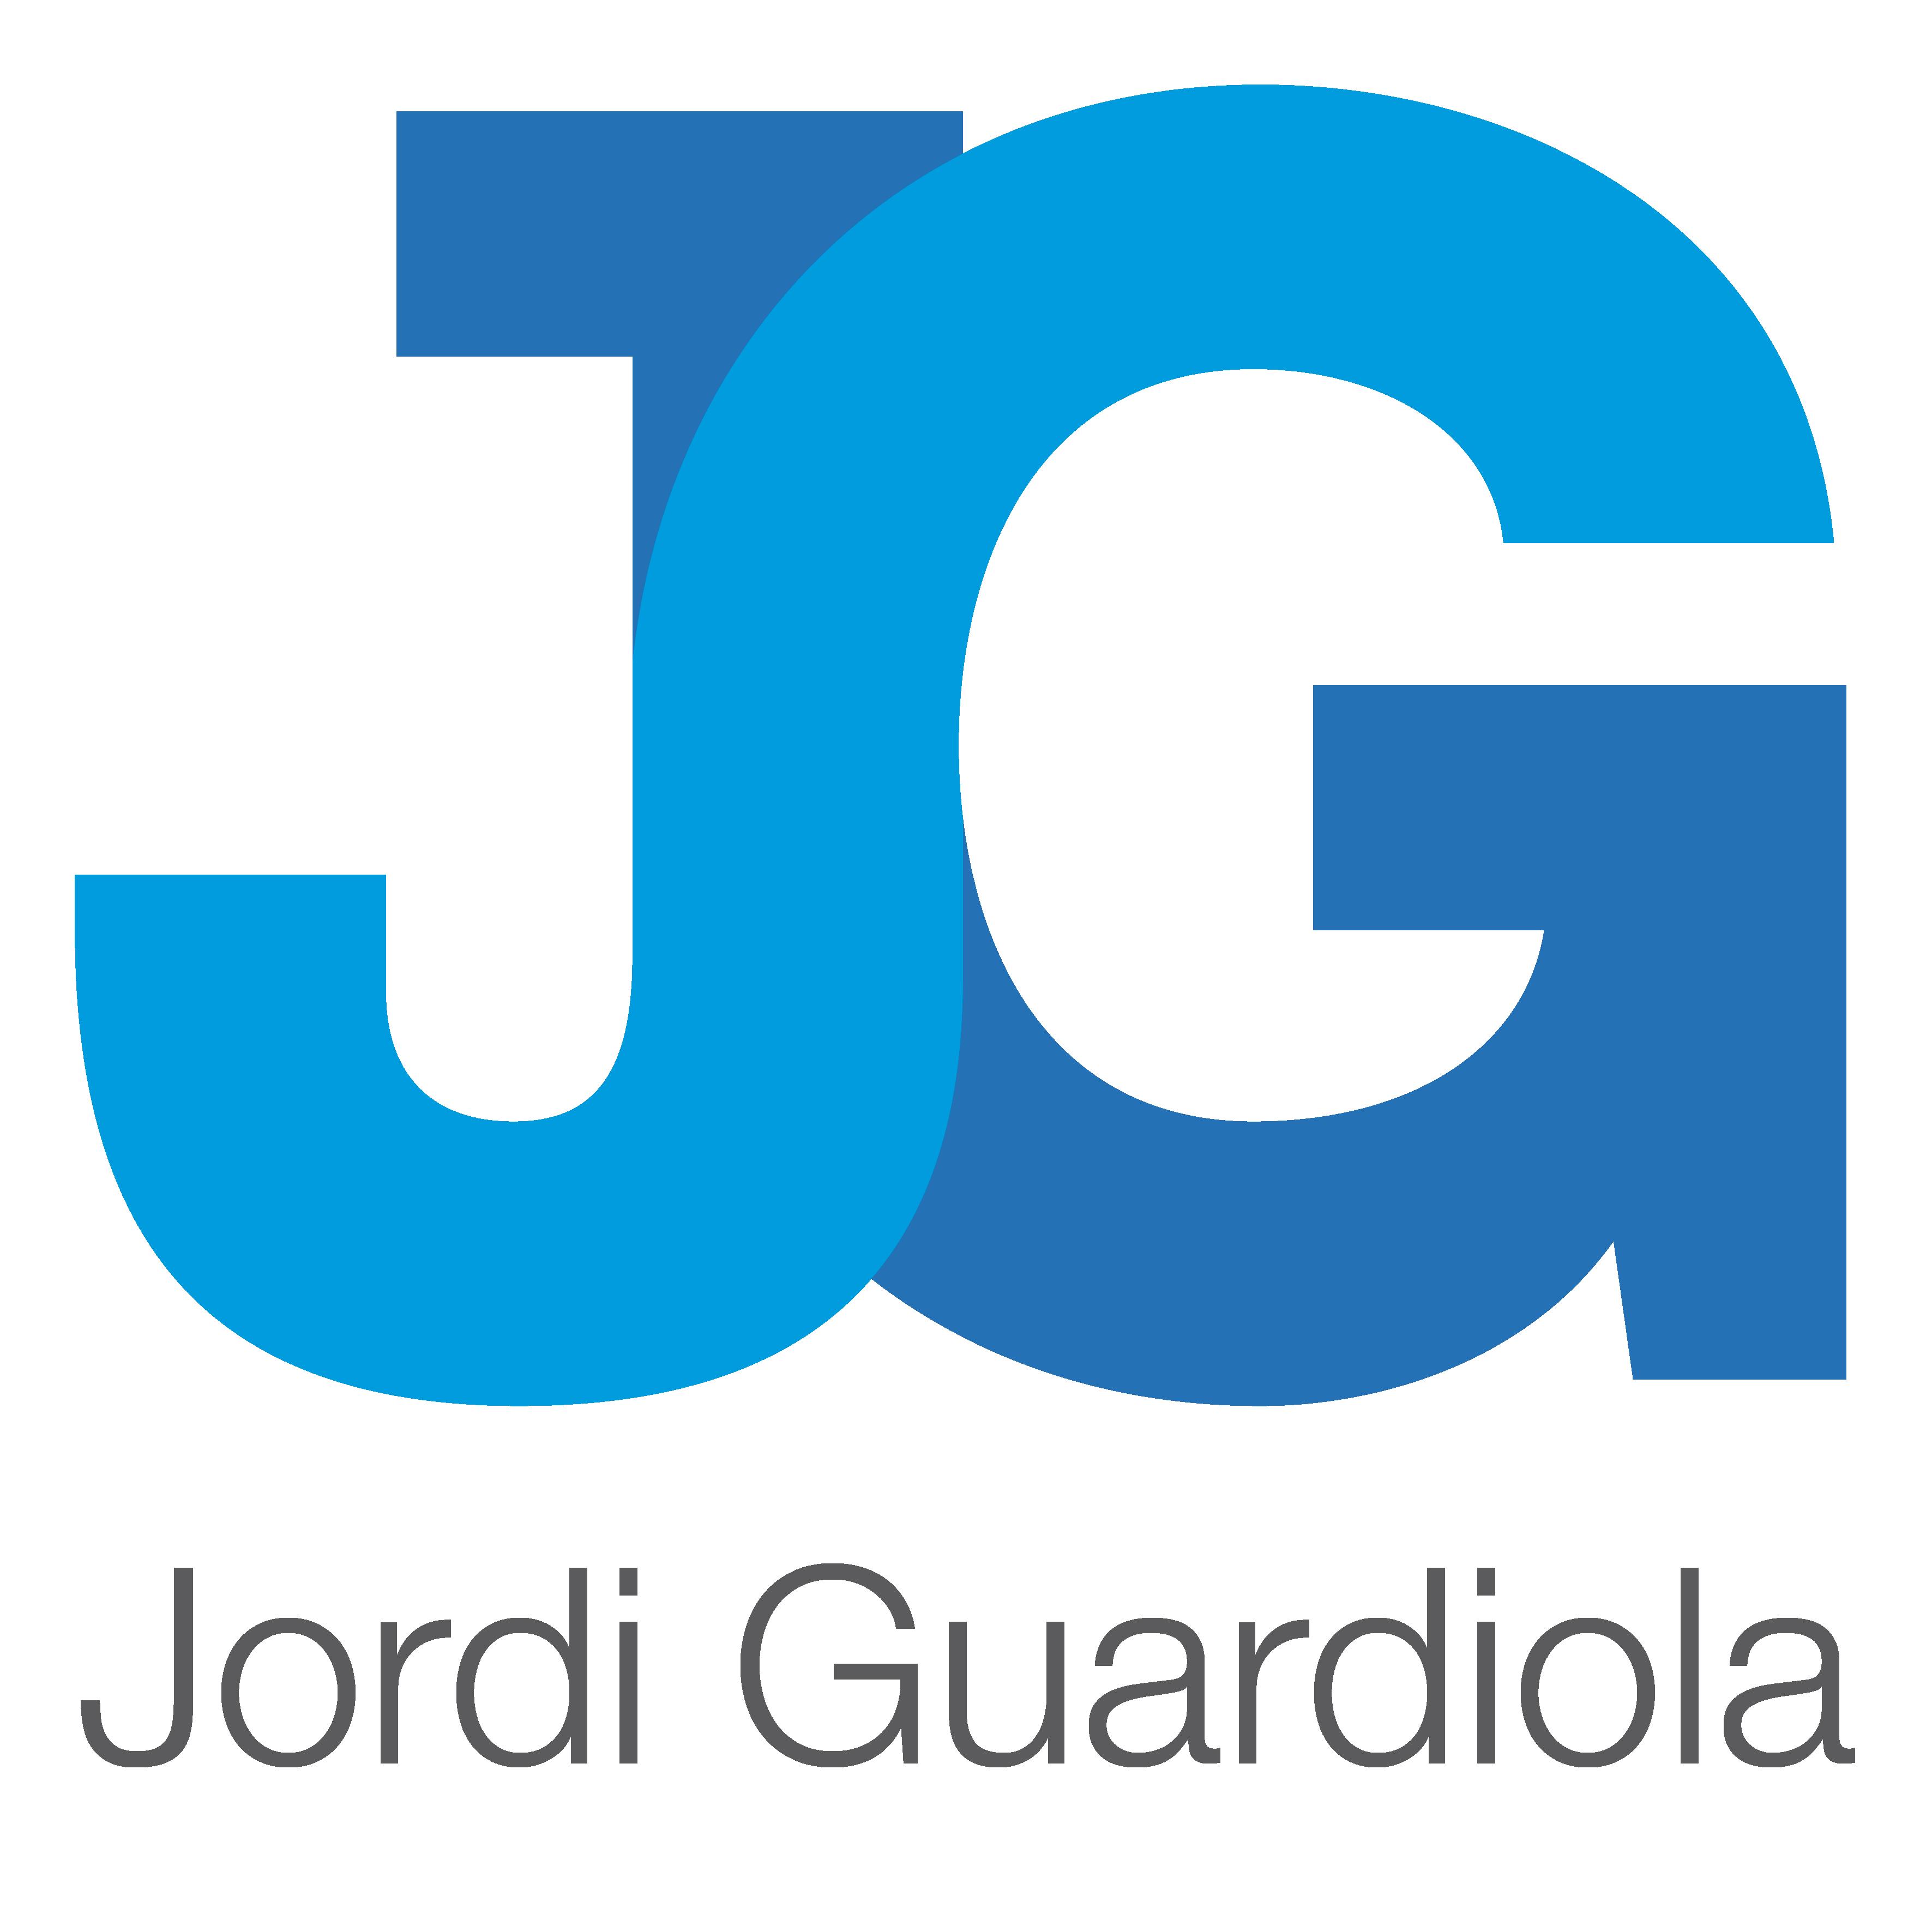 Jordi Guardiola